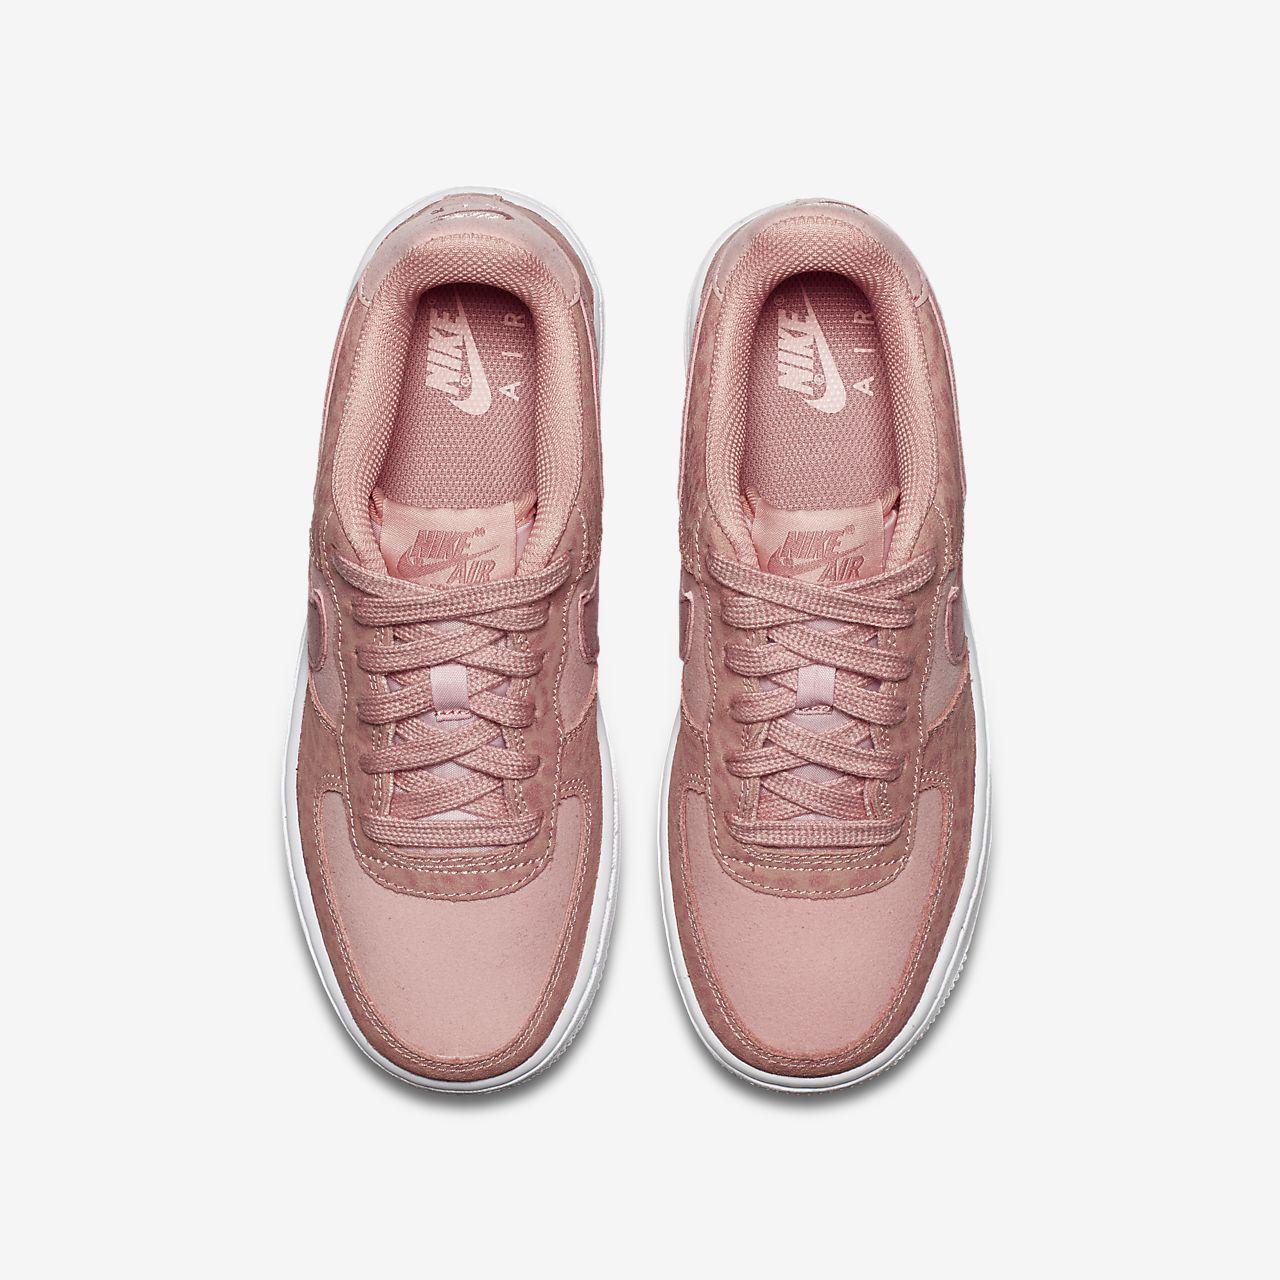 ... Nike Air Force 1 LV8 Shoe